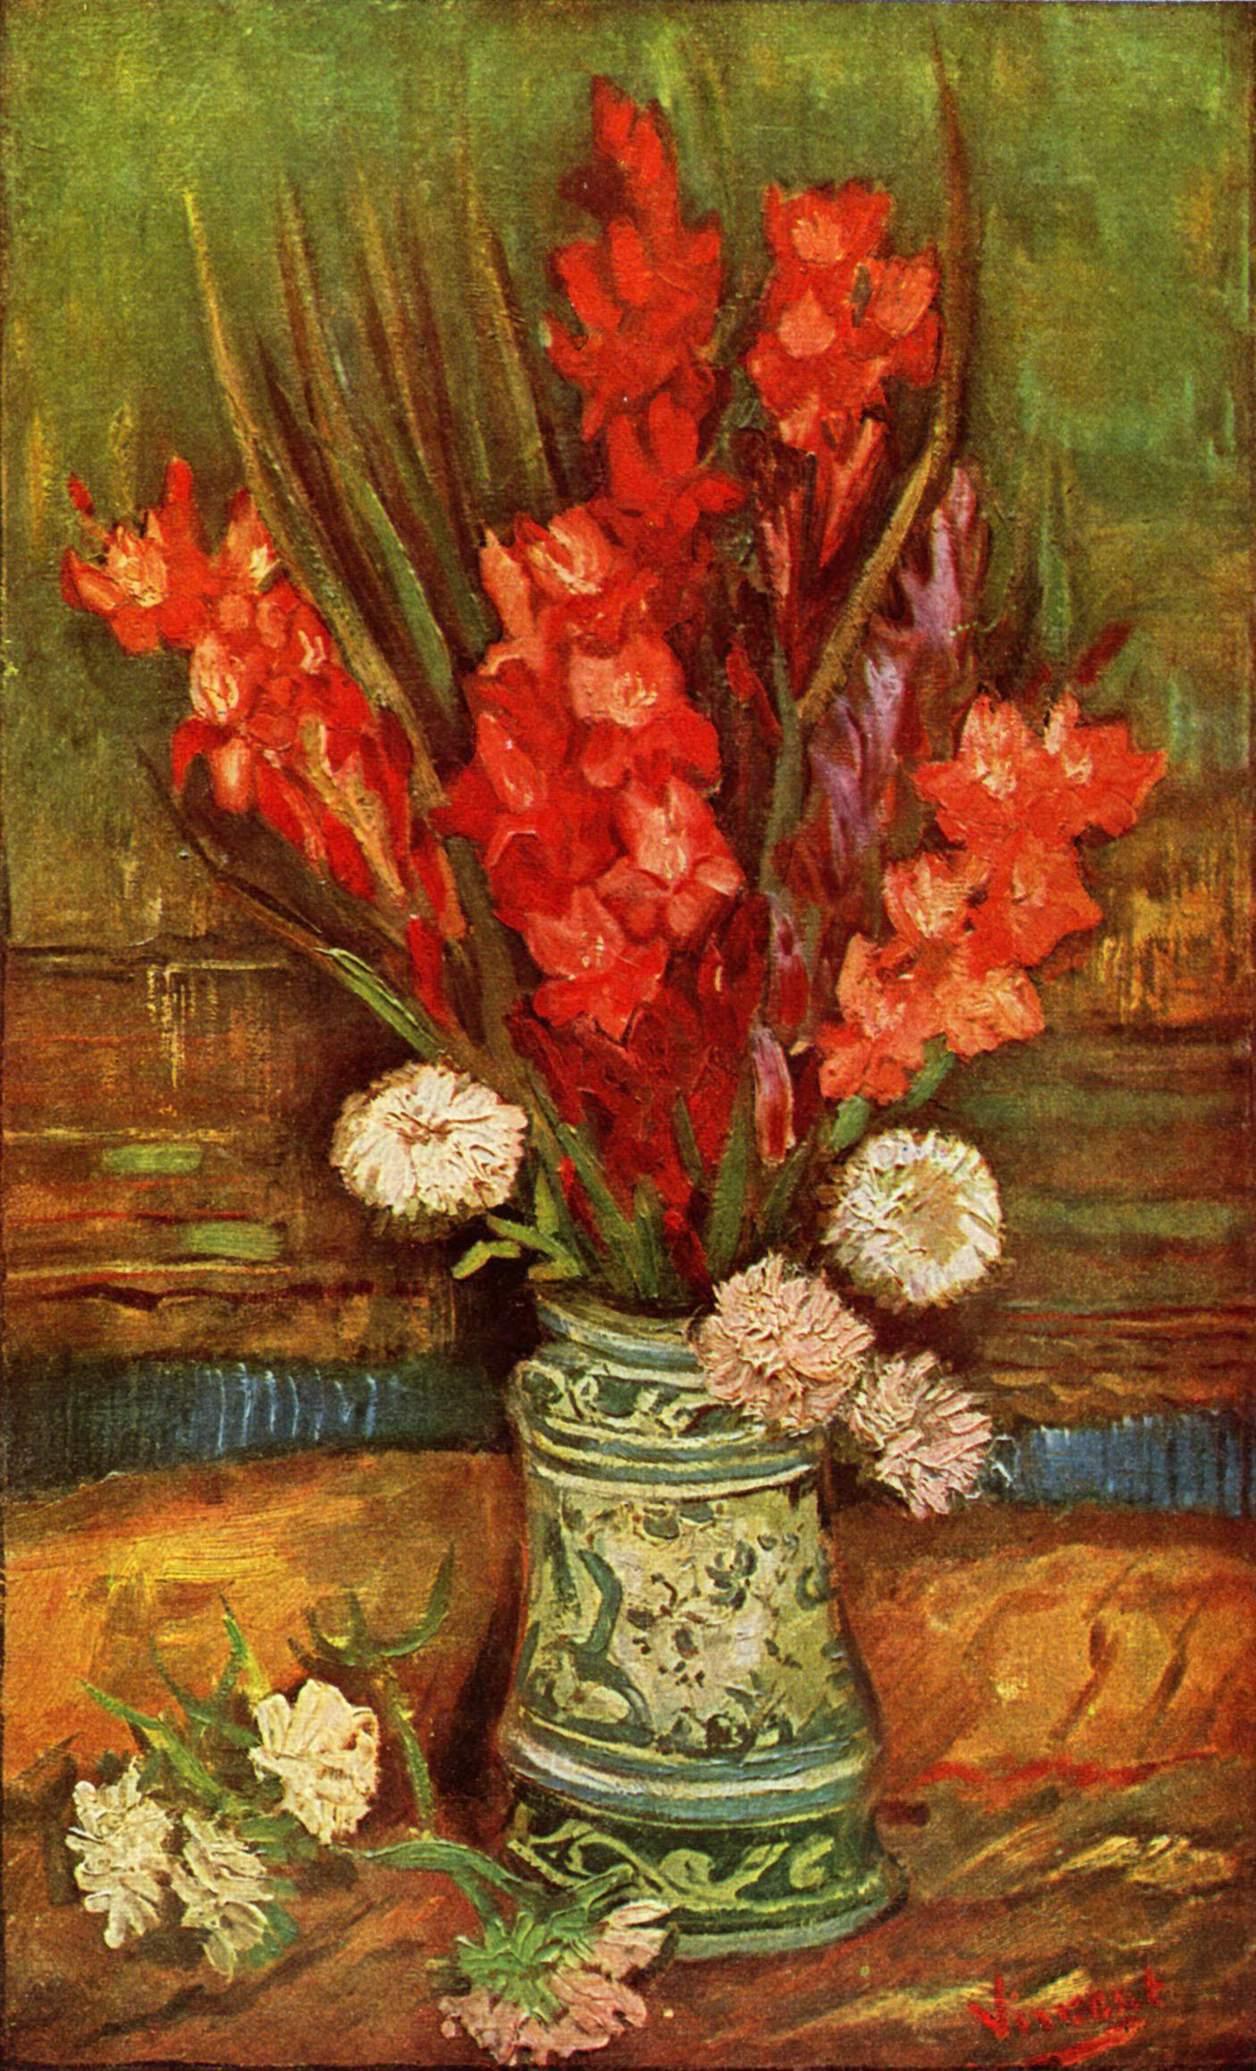 Vincent van gogh lessons tes teach still life paintings by vincent van gogh paris wikipedia the reviewsmspy